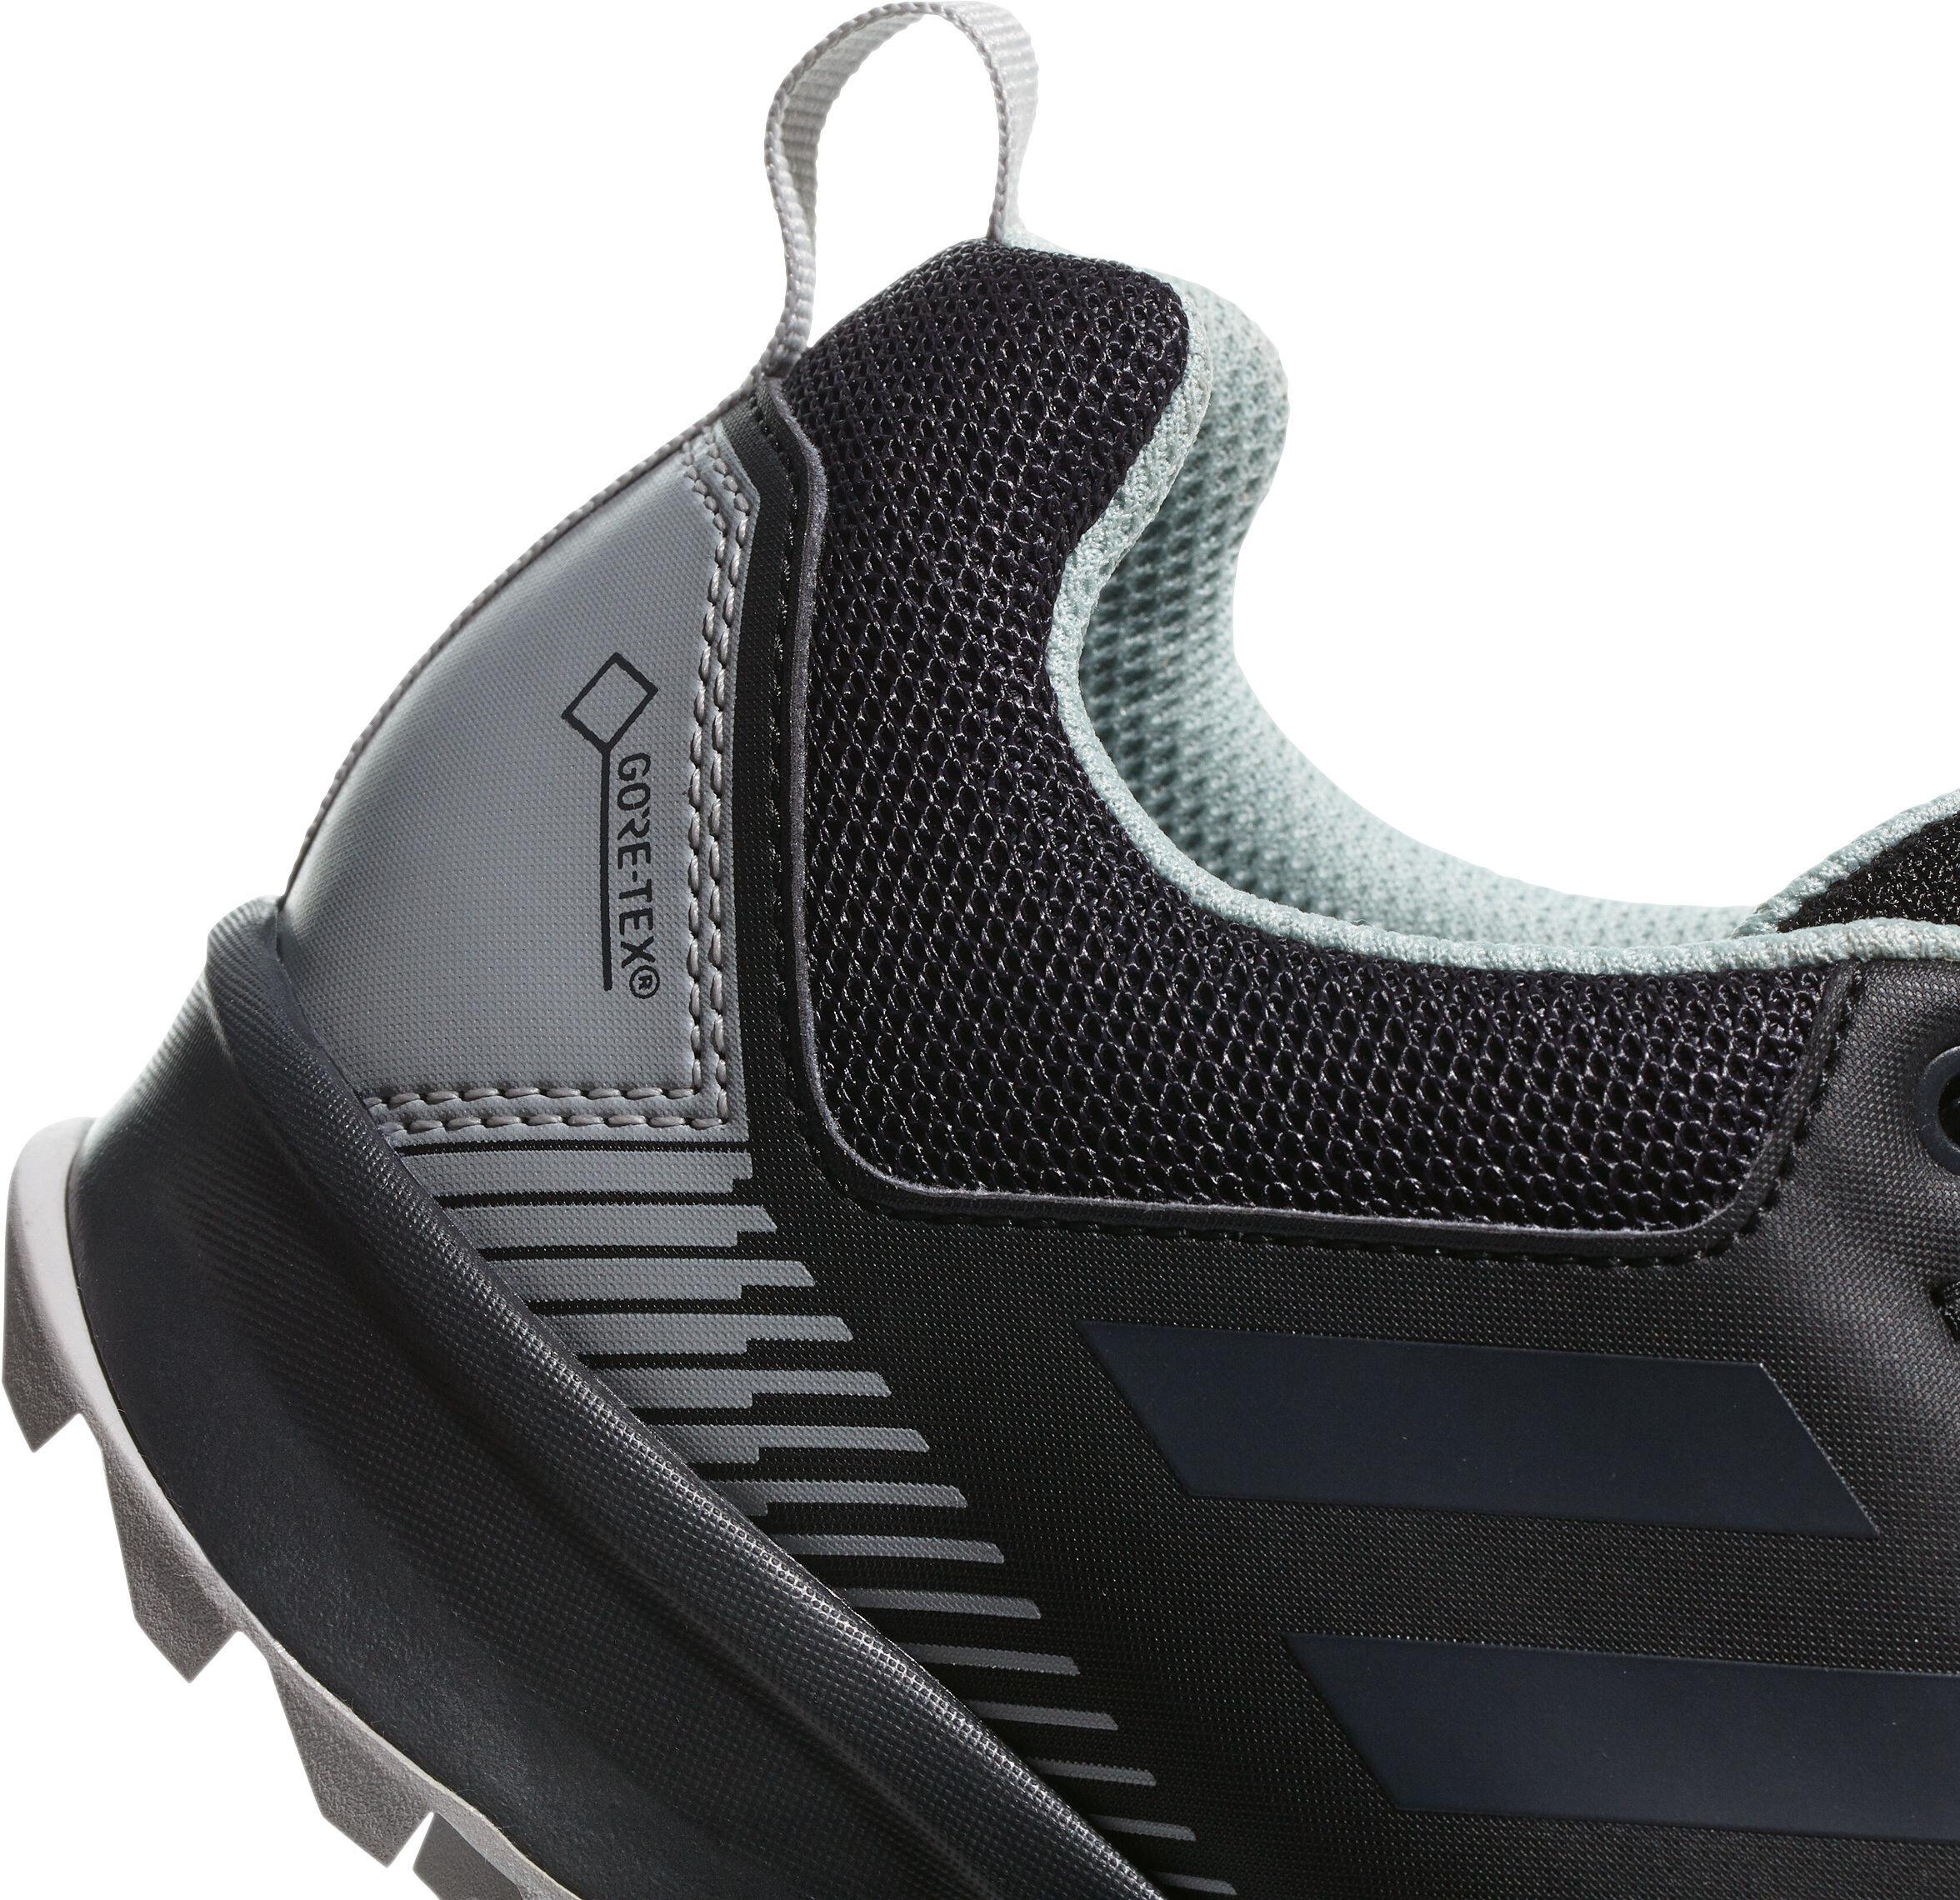 uk availability b42d6 3c000 adidas TERREX TraceRocker GTX Hardloopschoenen Dames zwart